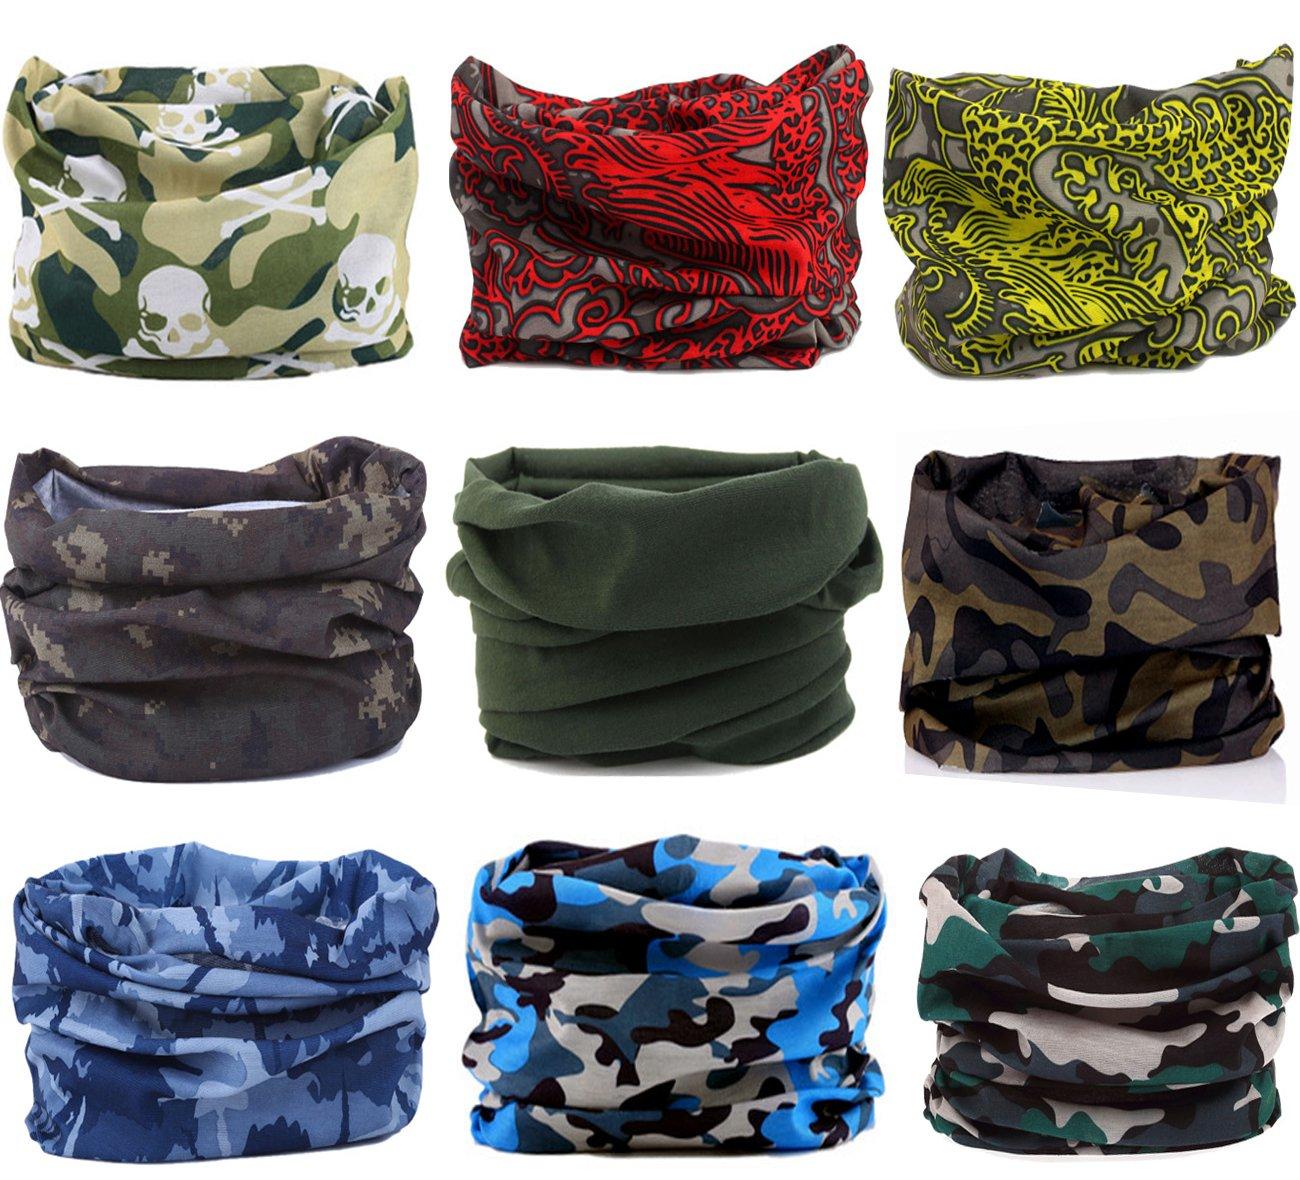 KINGREE 9PCS Headbands, Outdoor Multifunctional Headwear, Sports Magic Scarf, High Elastic Headband with UV Resistance, Athletic Headwrap, Mens Sweatband, Womens Hairband (Camo&MixMatch E2)